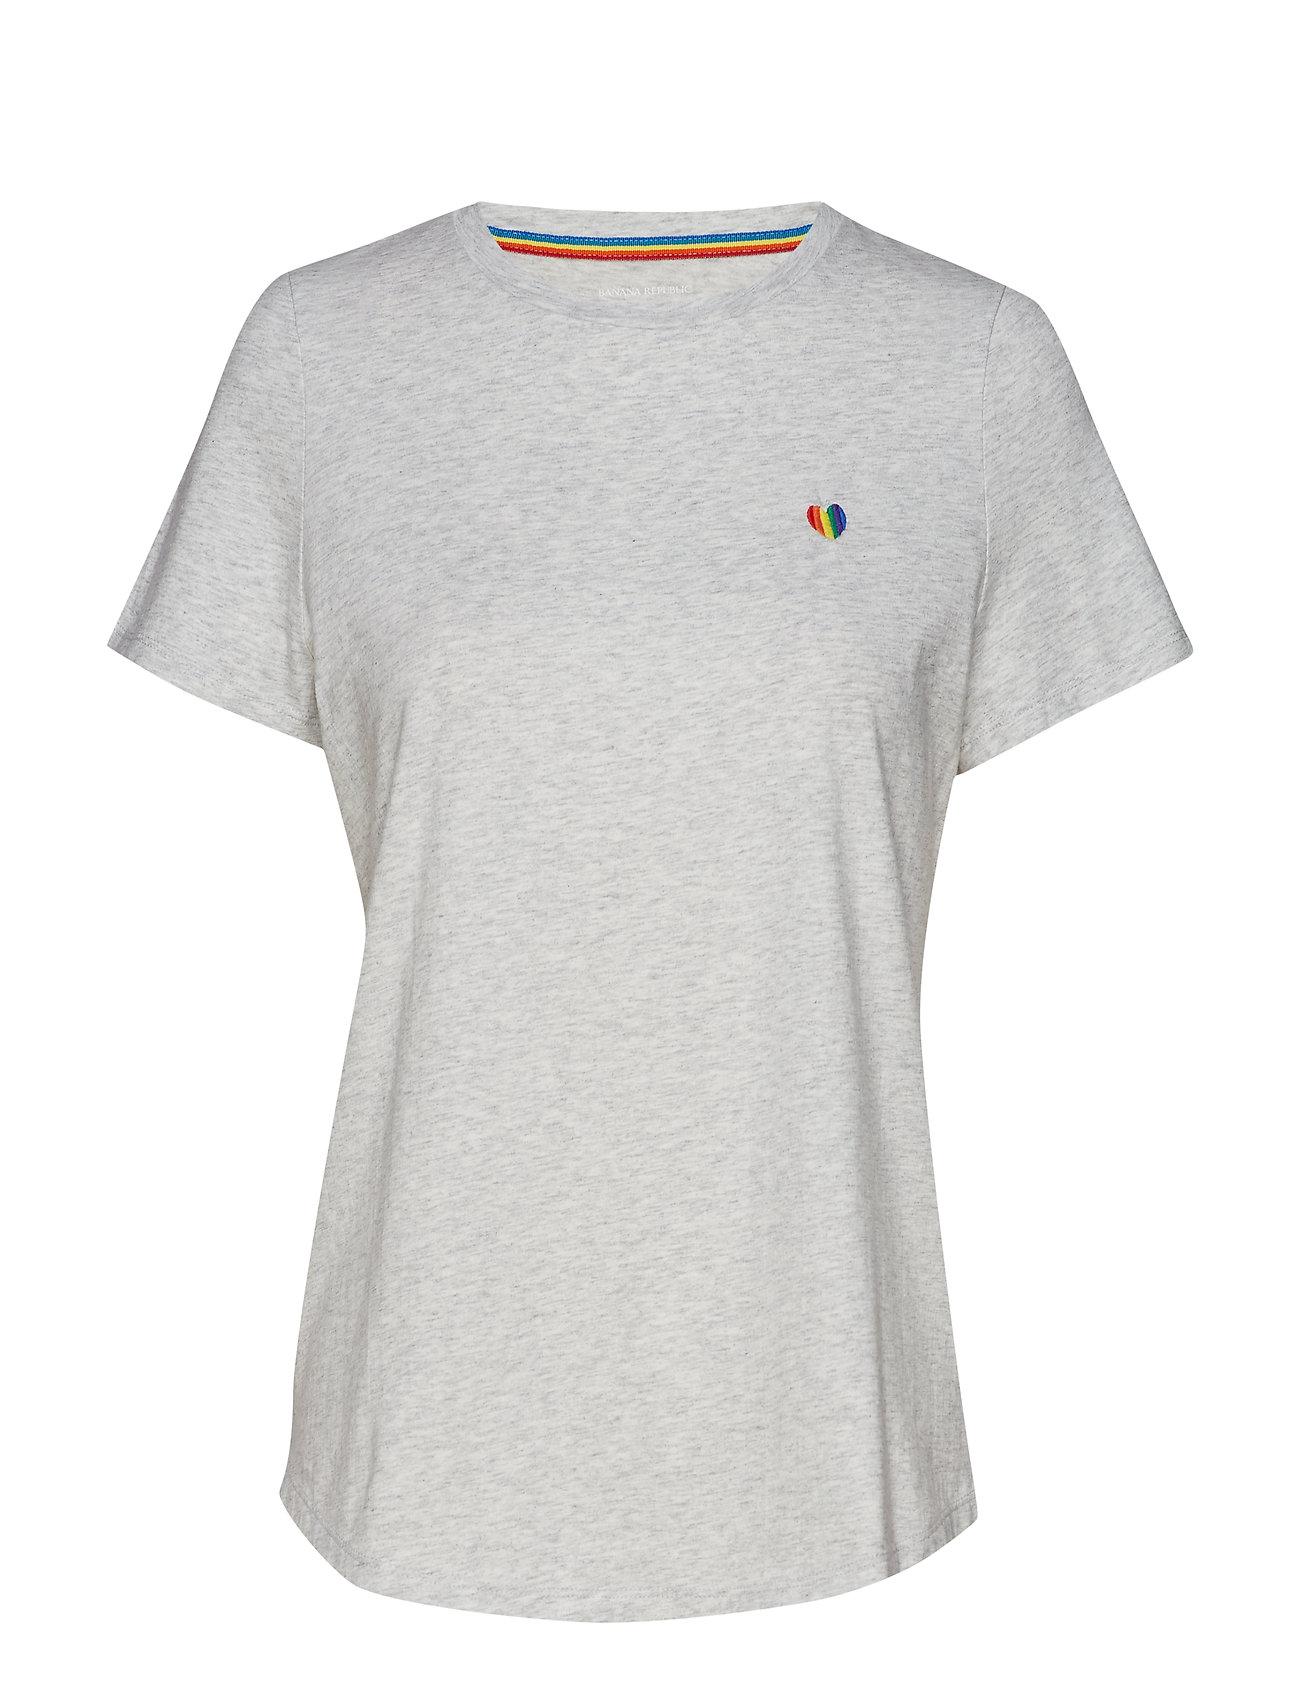 Banana Republic Pride 2019 Heart T-Shirt (Women's Sizes) - LIGHT GREY